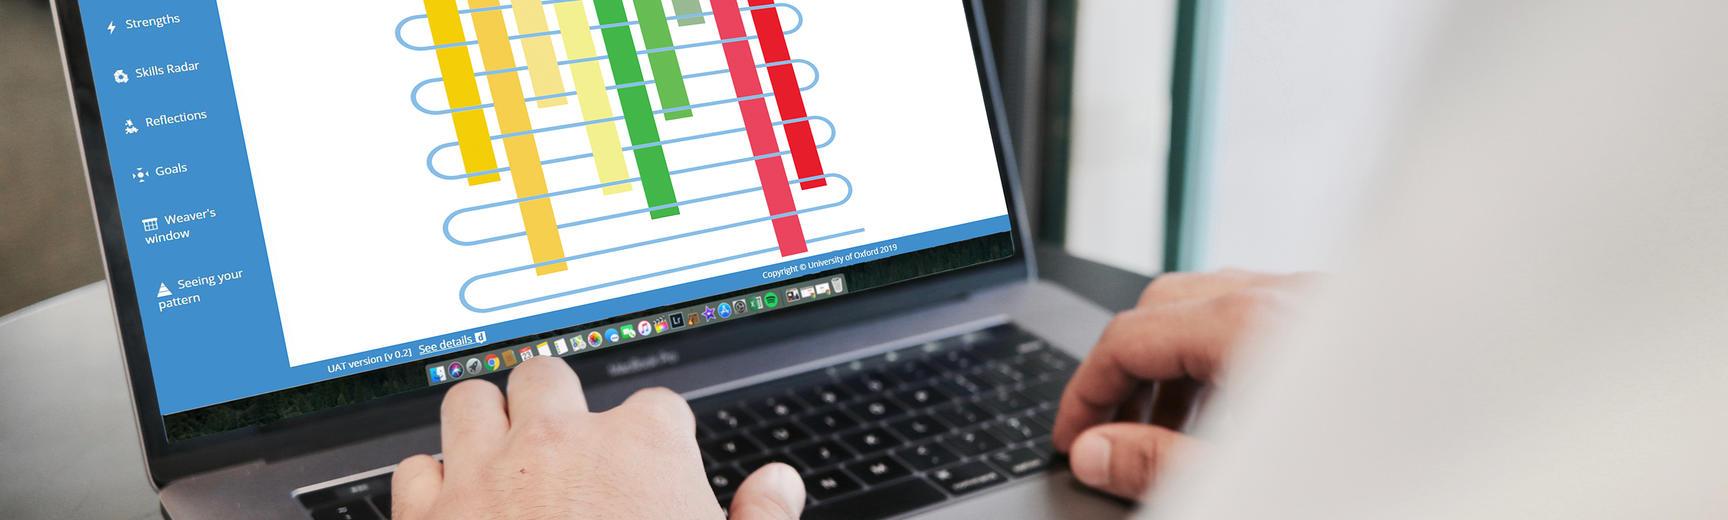 Career Weaver app on a laptop